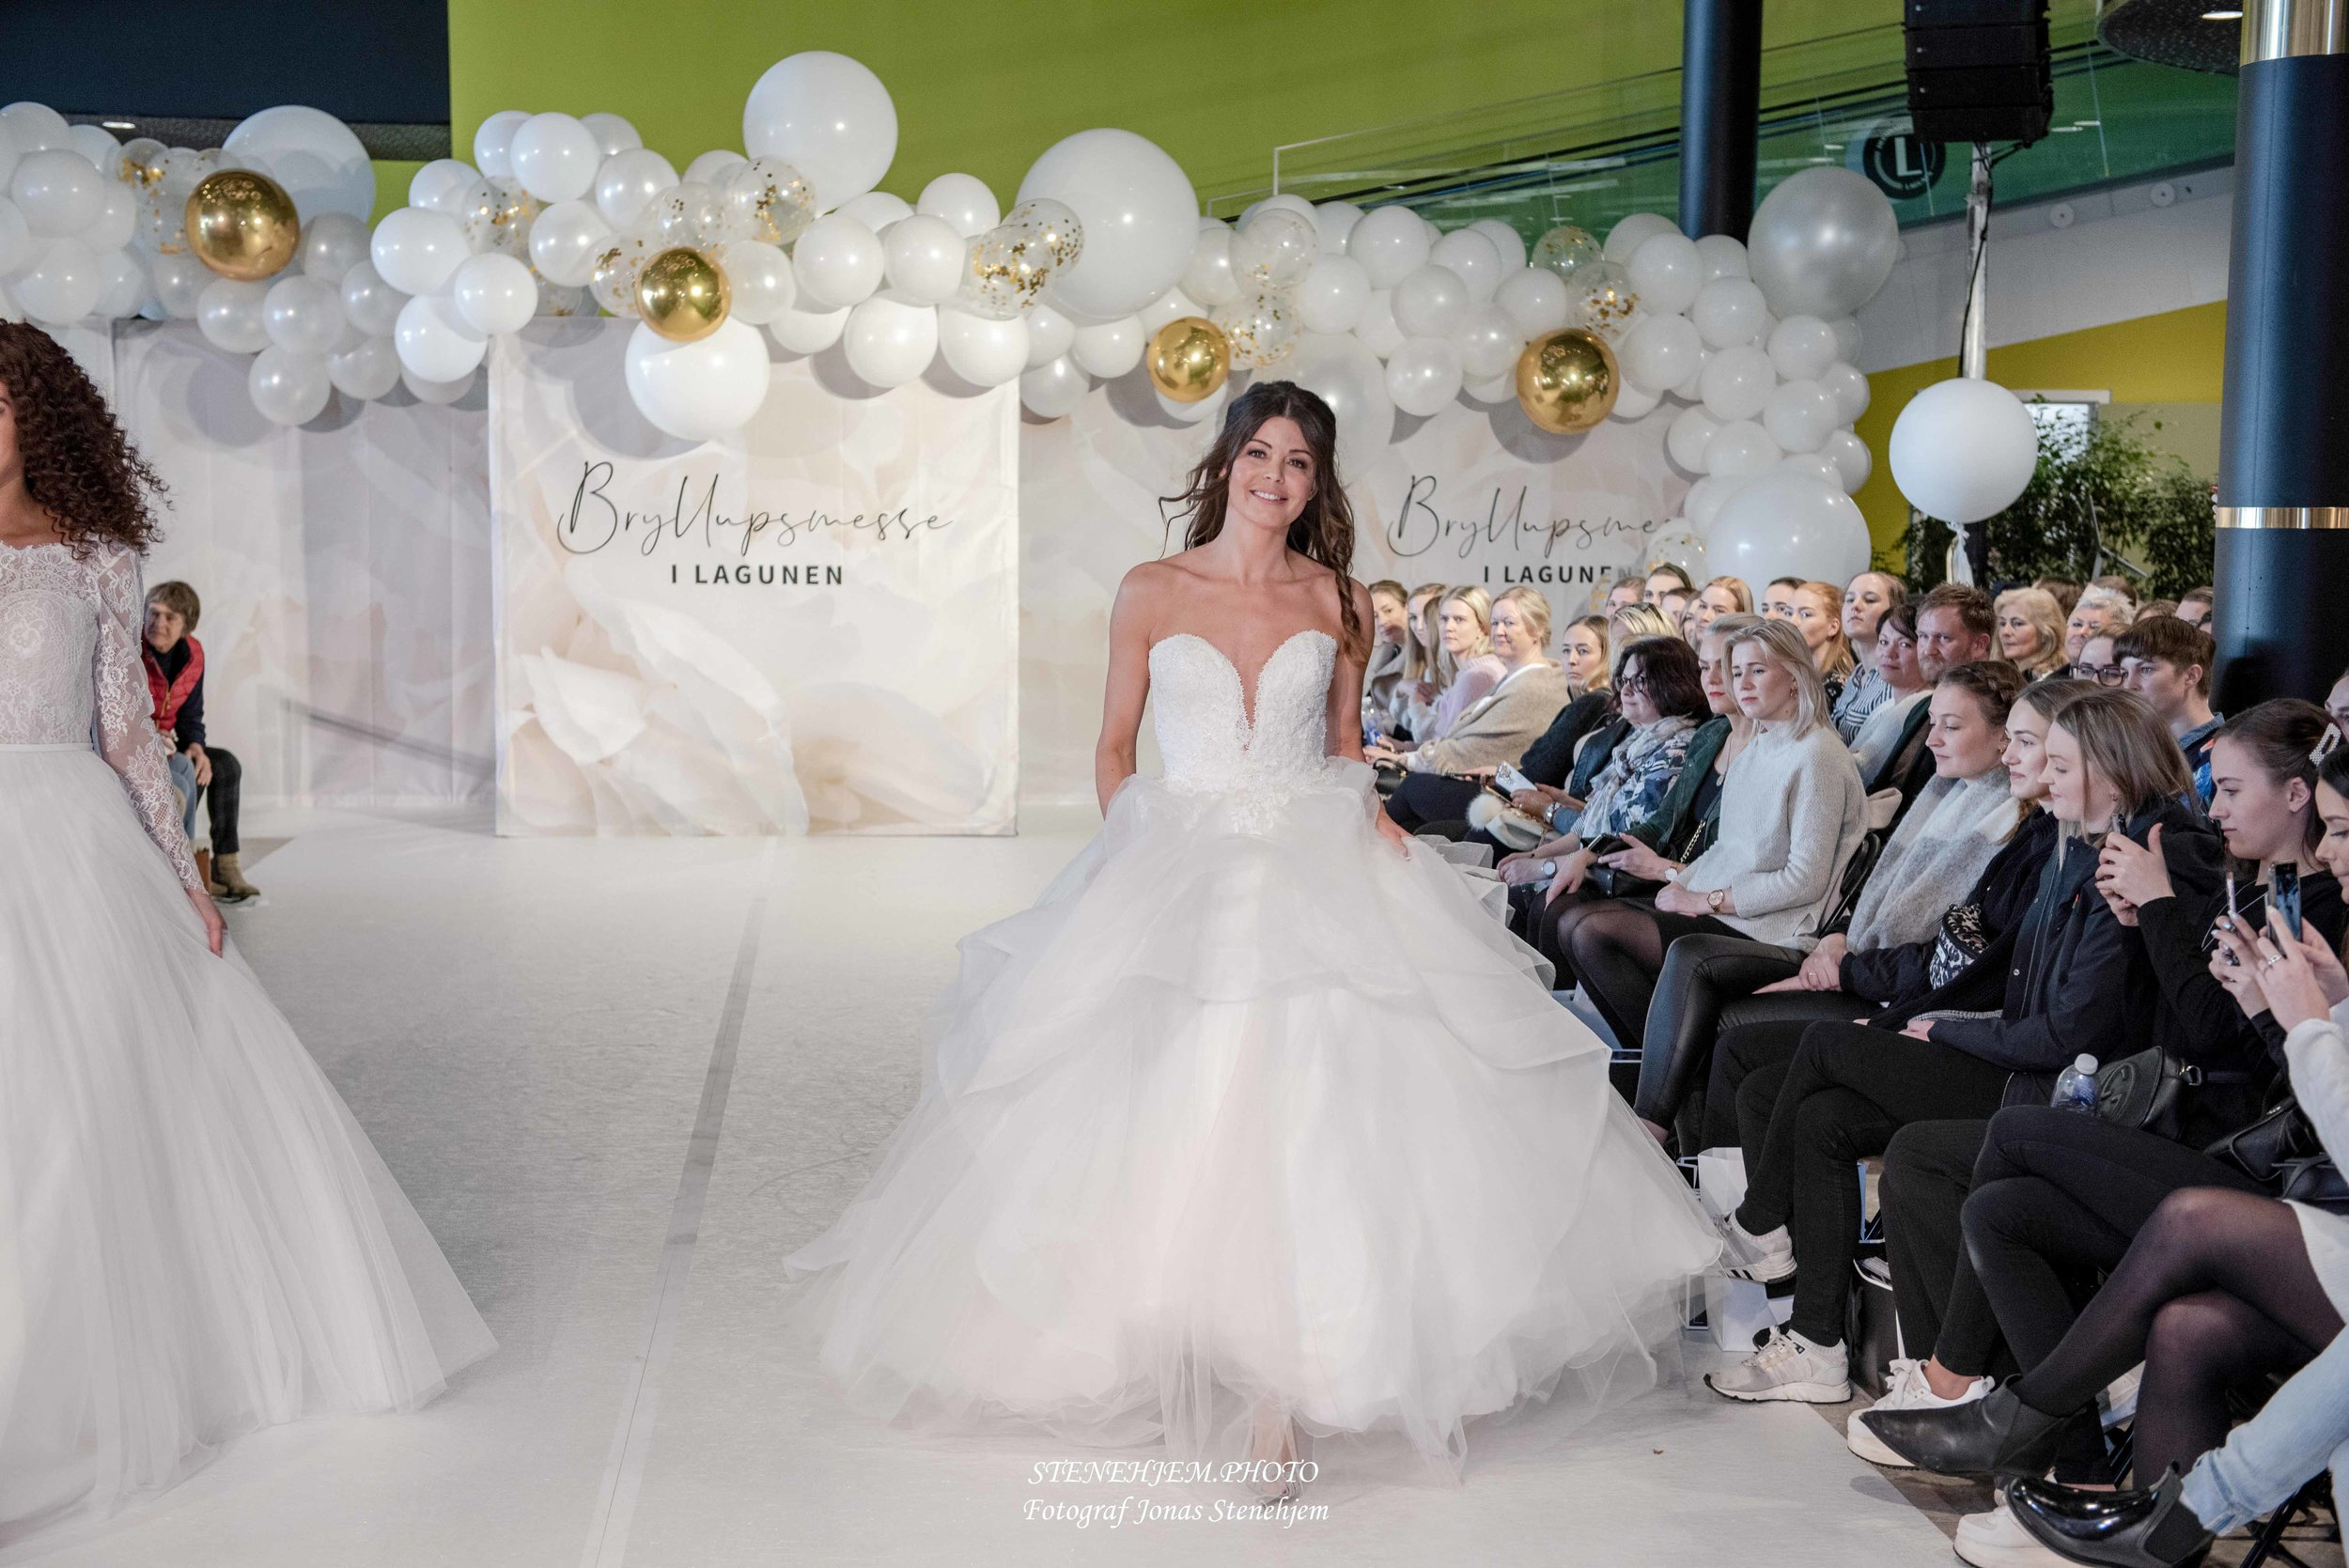 Bryllupsmesse_Lagunen_mittaltweddingfair__091.jpg